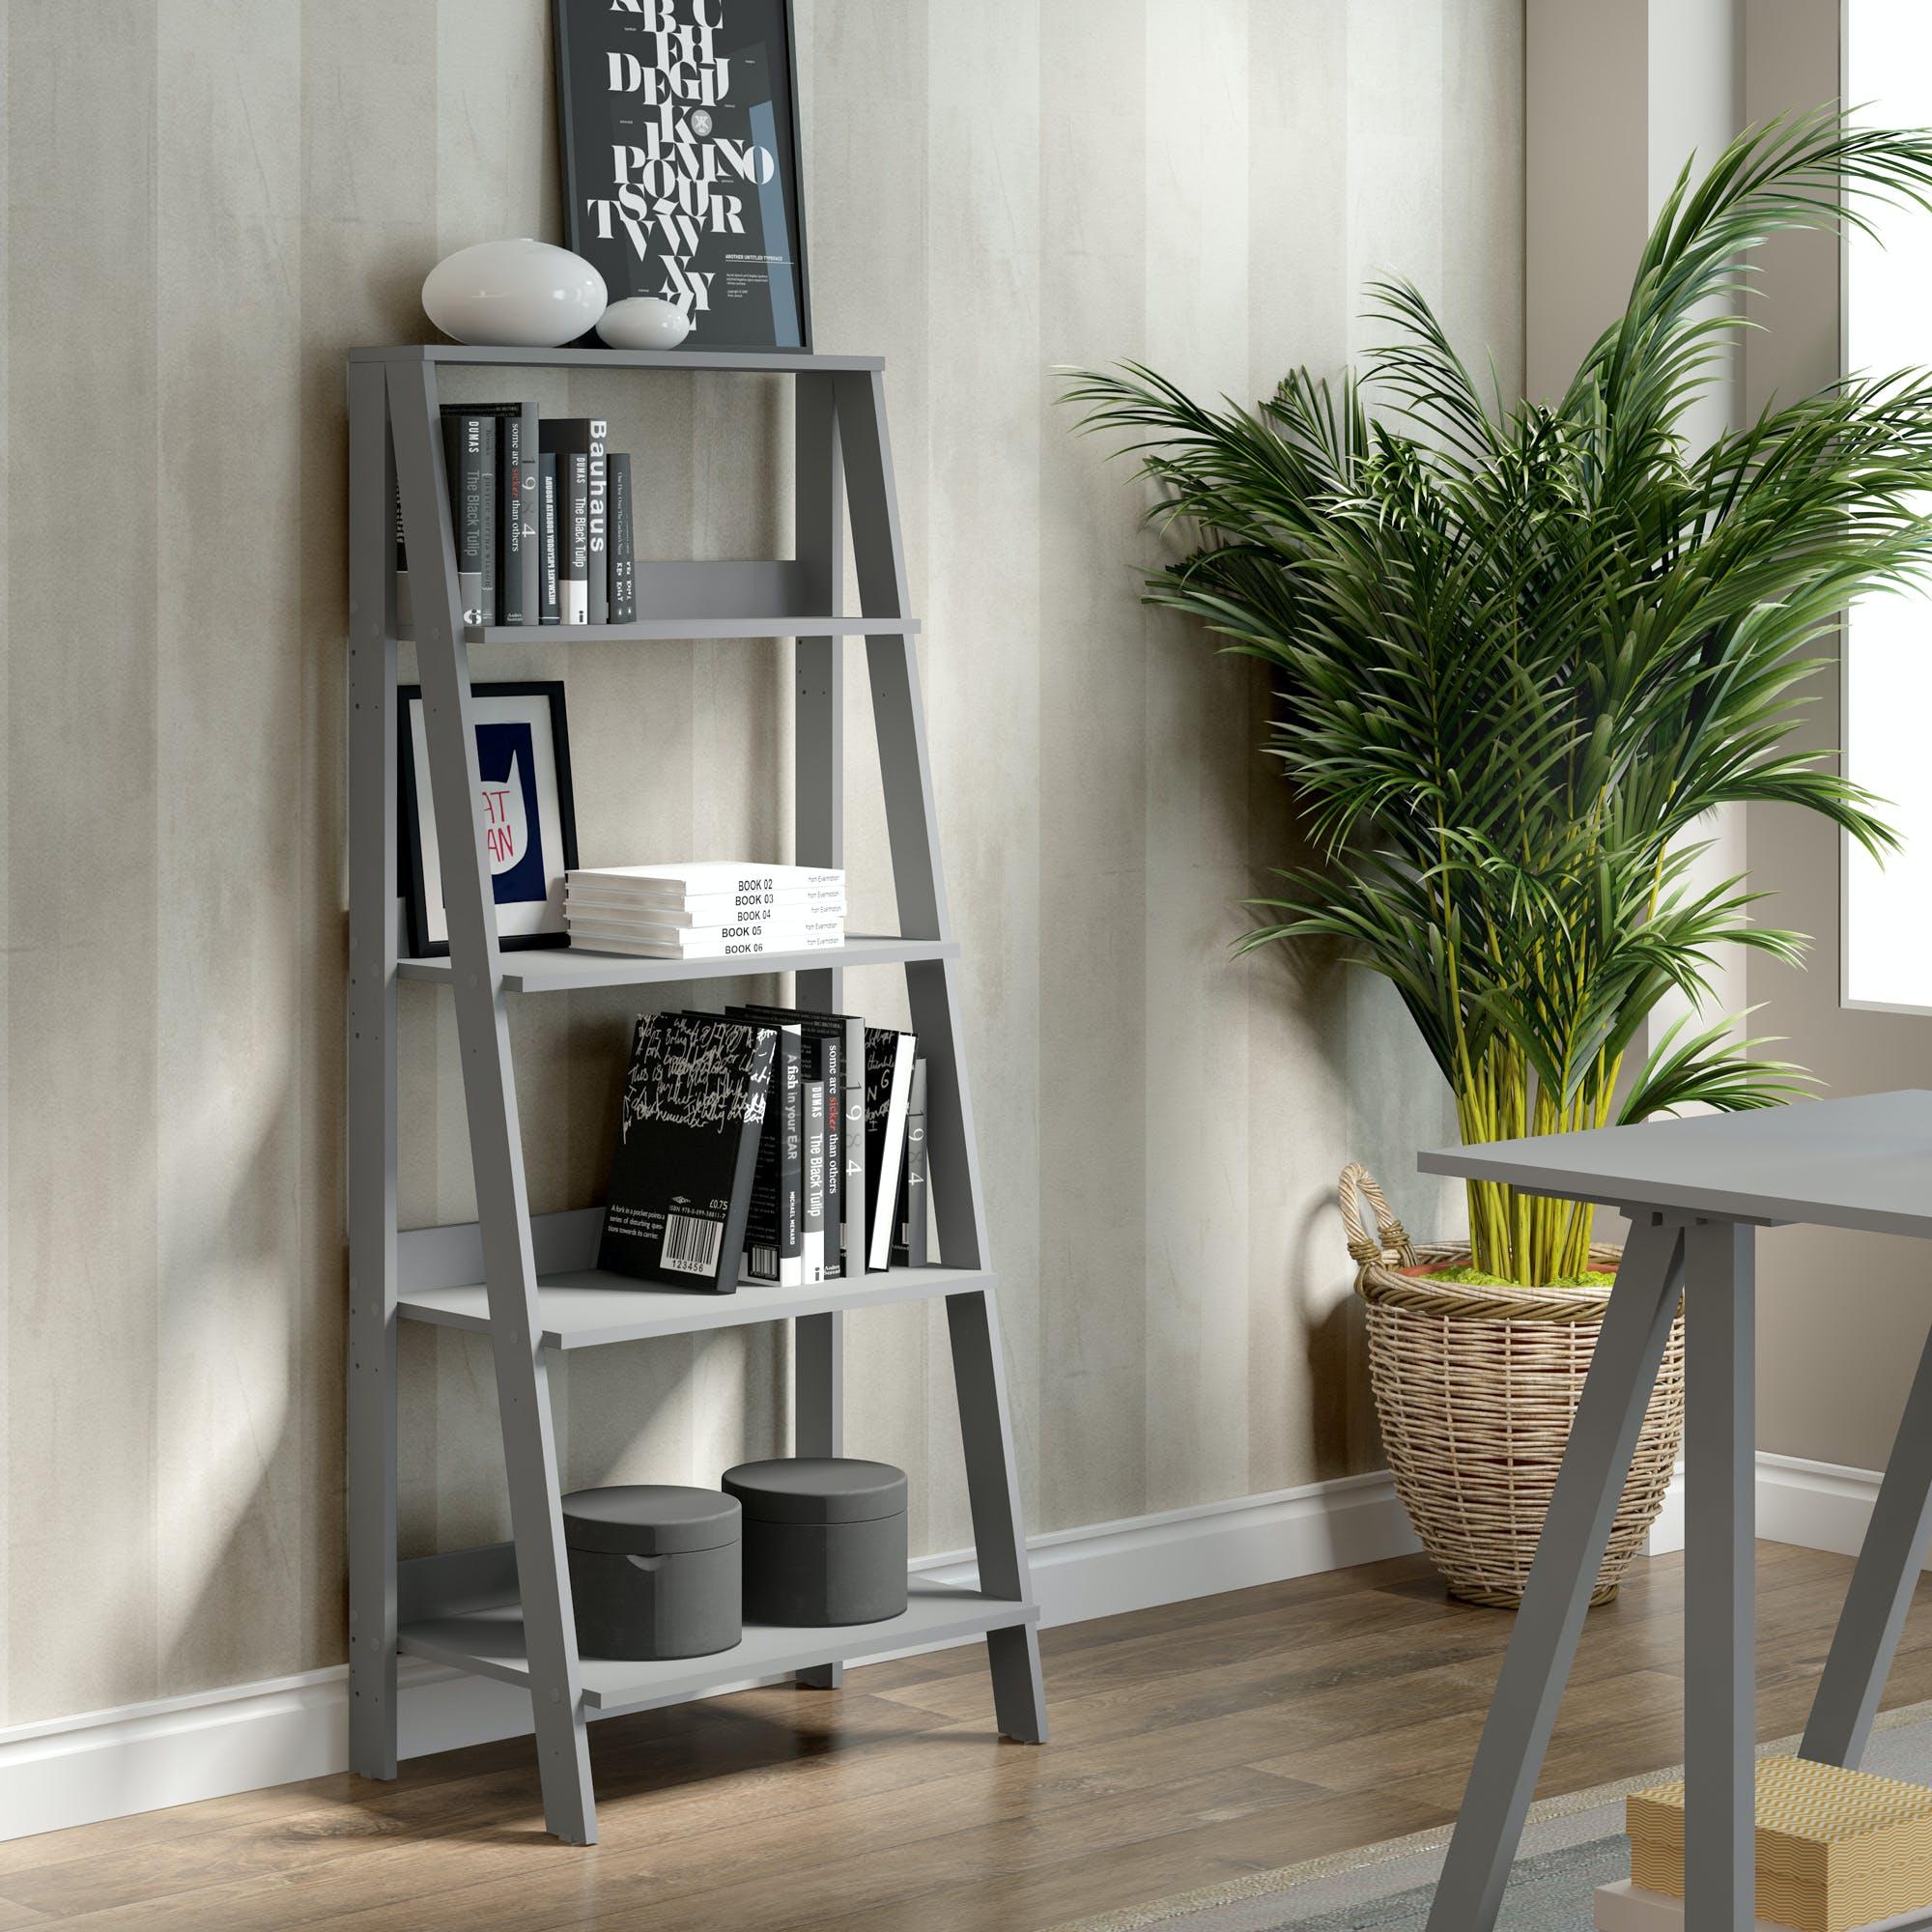 Ft Myers Home Office 55 Wood Ladder Bookshelf Wedbs55ldgy Walter E Smithe Furniture Design